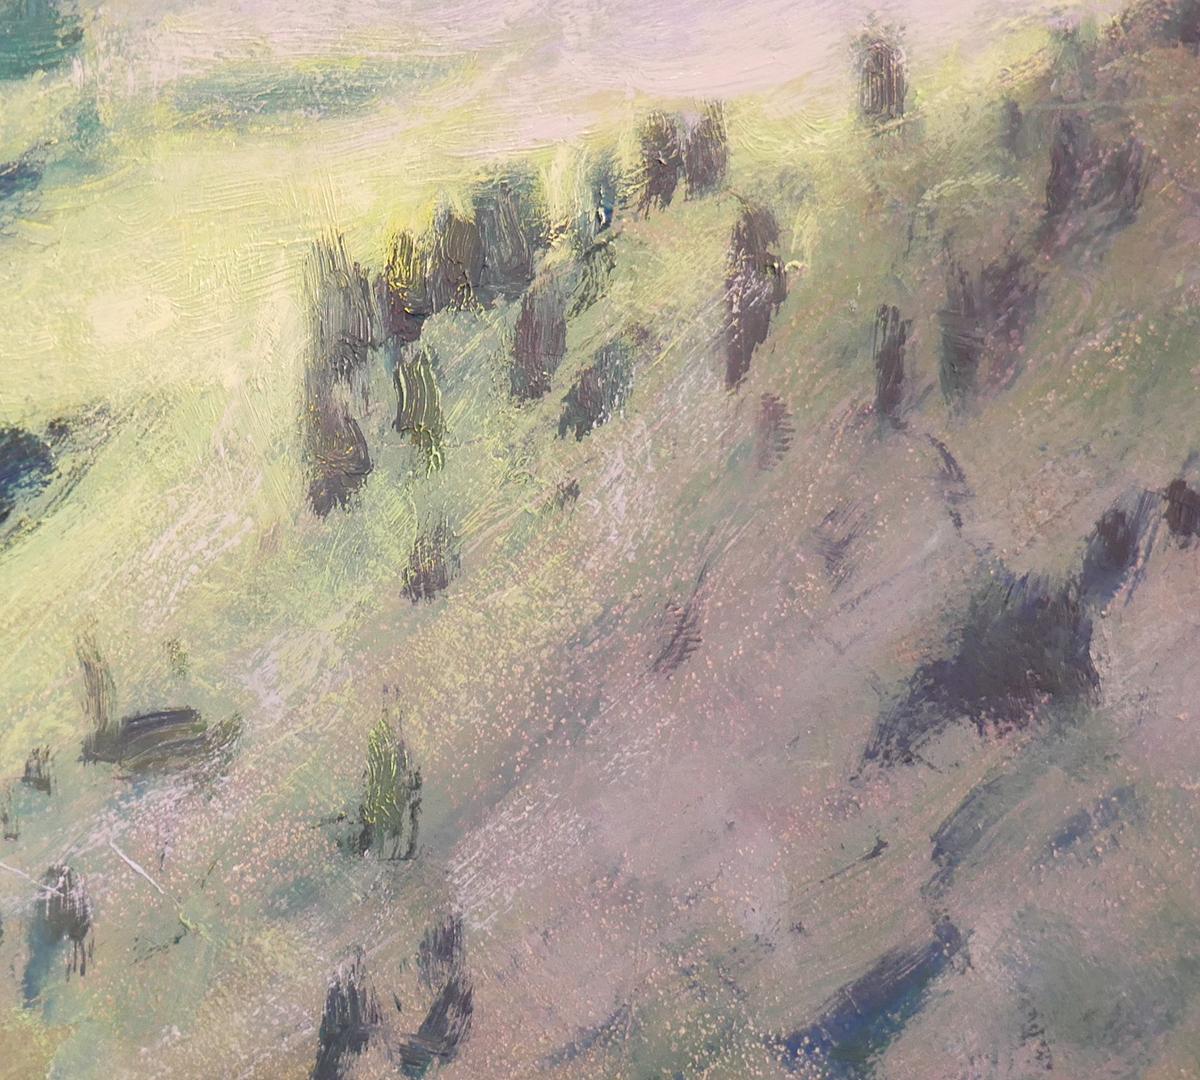 Dan Scott, American Mountains, 2020, Detail 2